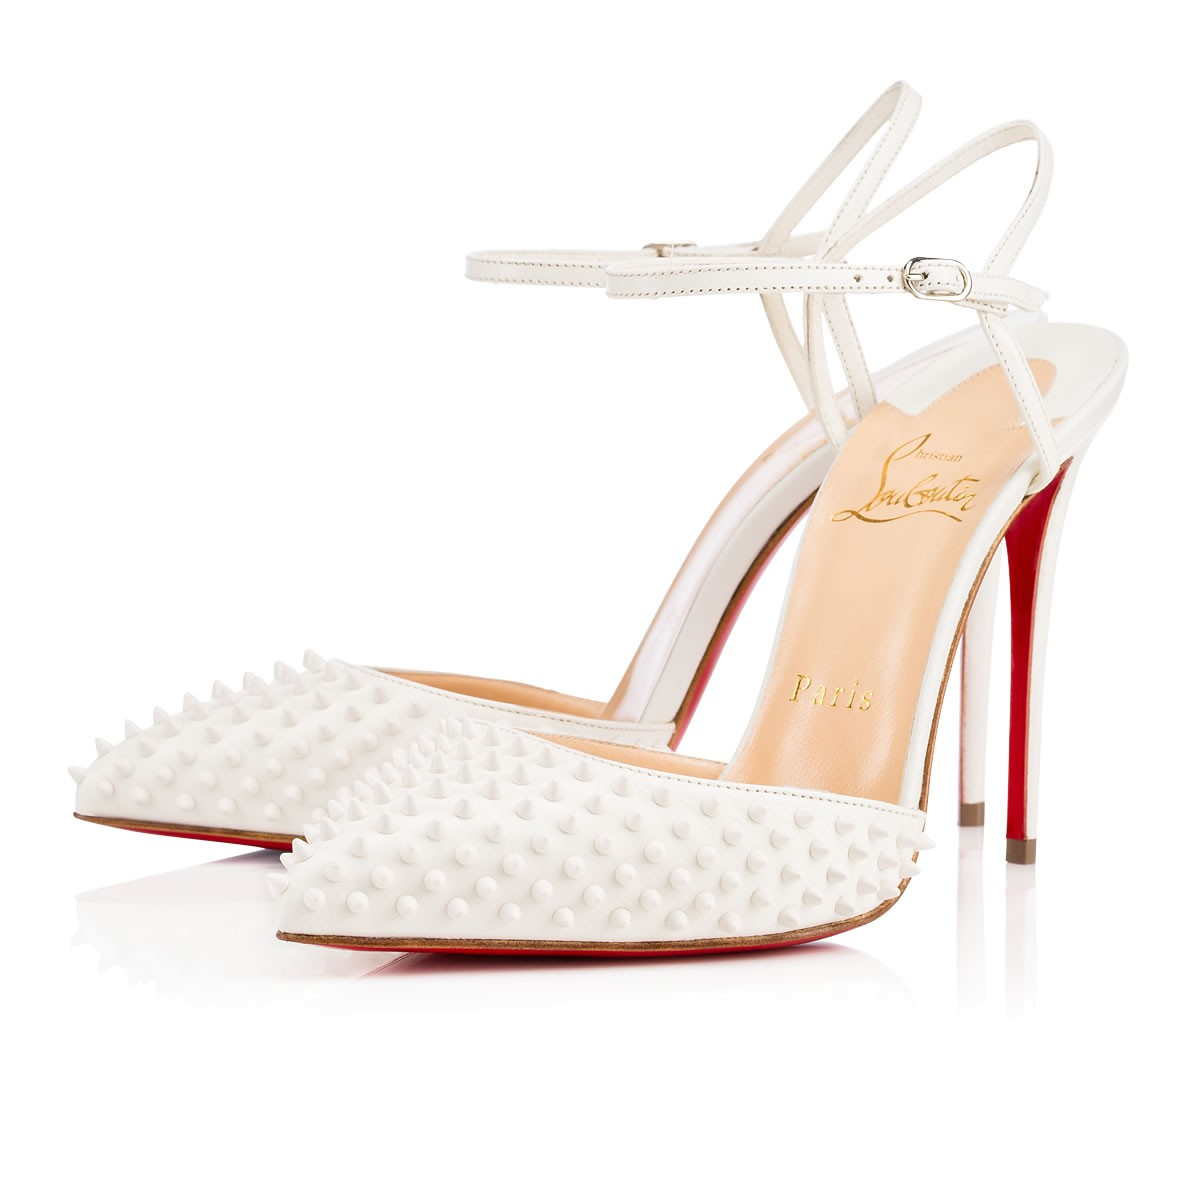 fcd5b062fc2 Christian Louboutin Baila Spike Shoes | Satchel